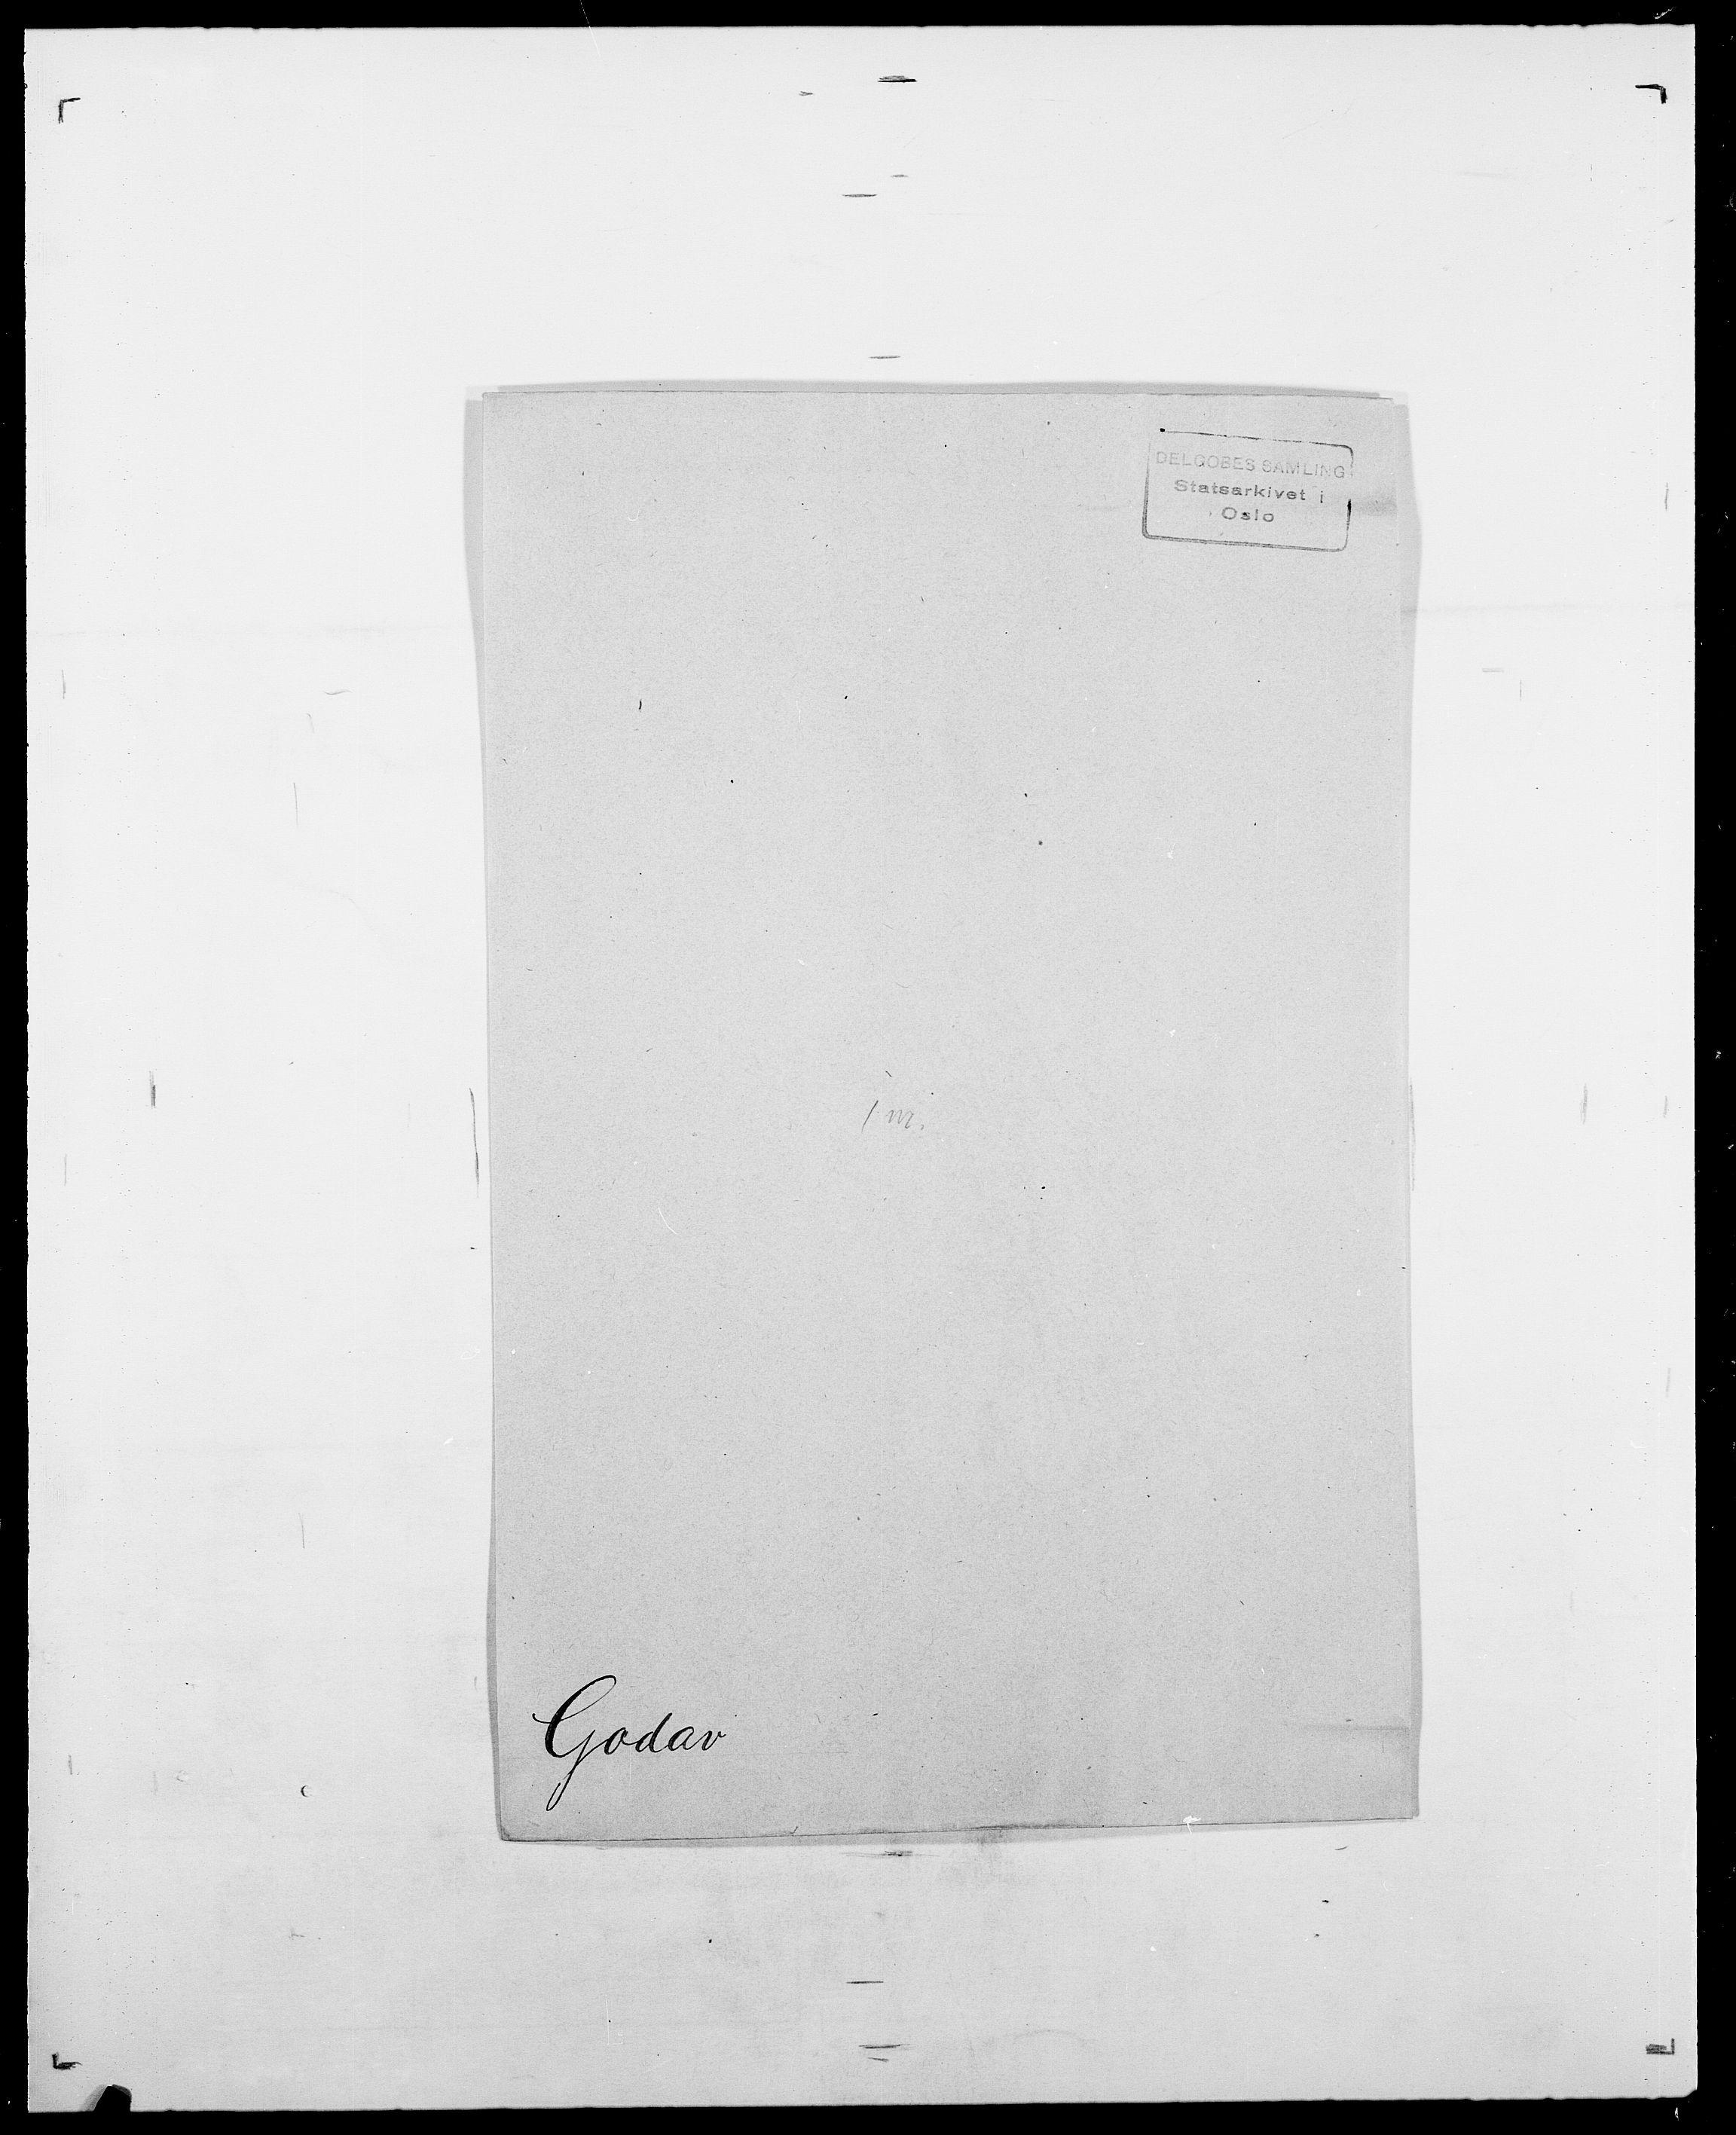 SAO, Delgobe, Charles Antoine - samling, D/Da/L0014: Giebdhausen - Grip, s. 360